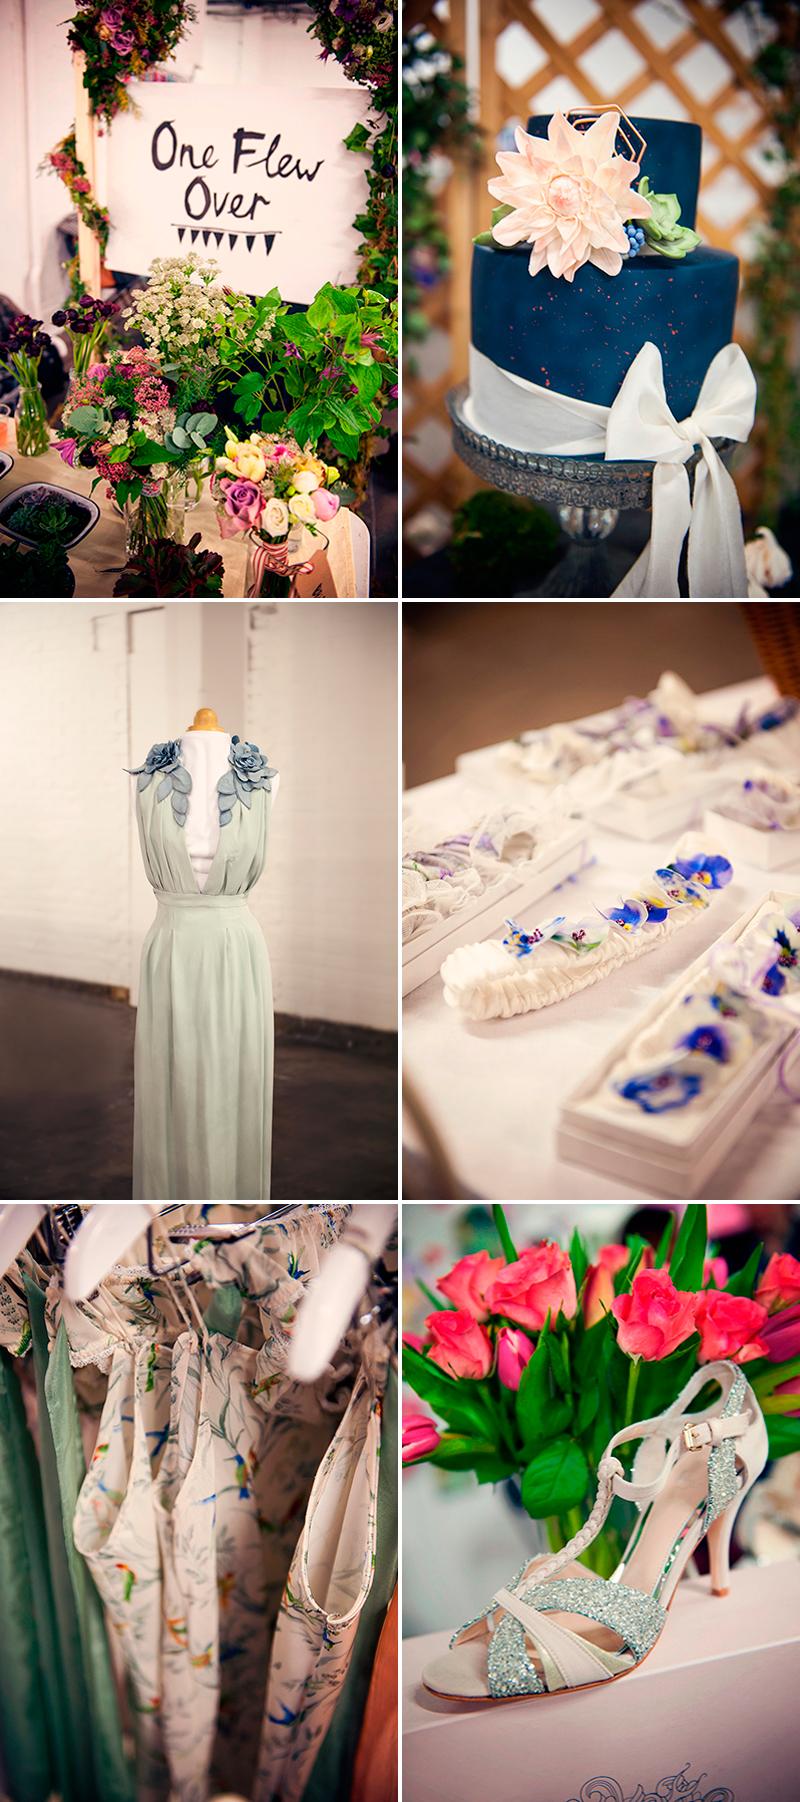 a-guide-to-wedding-fairs-wedding-planning-coco-wedding-venues-009